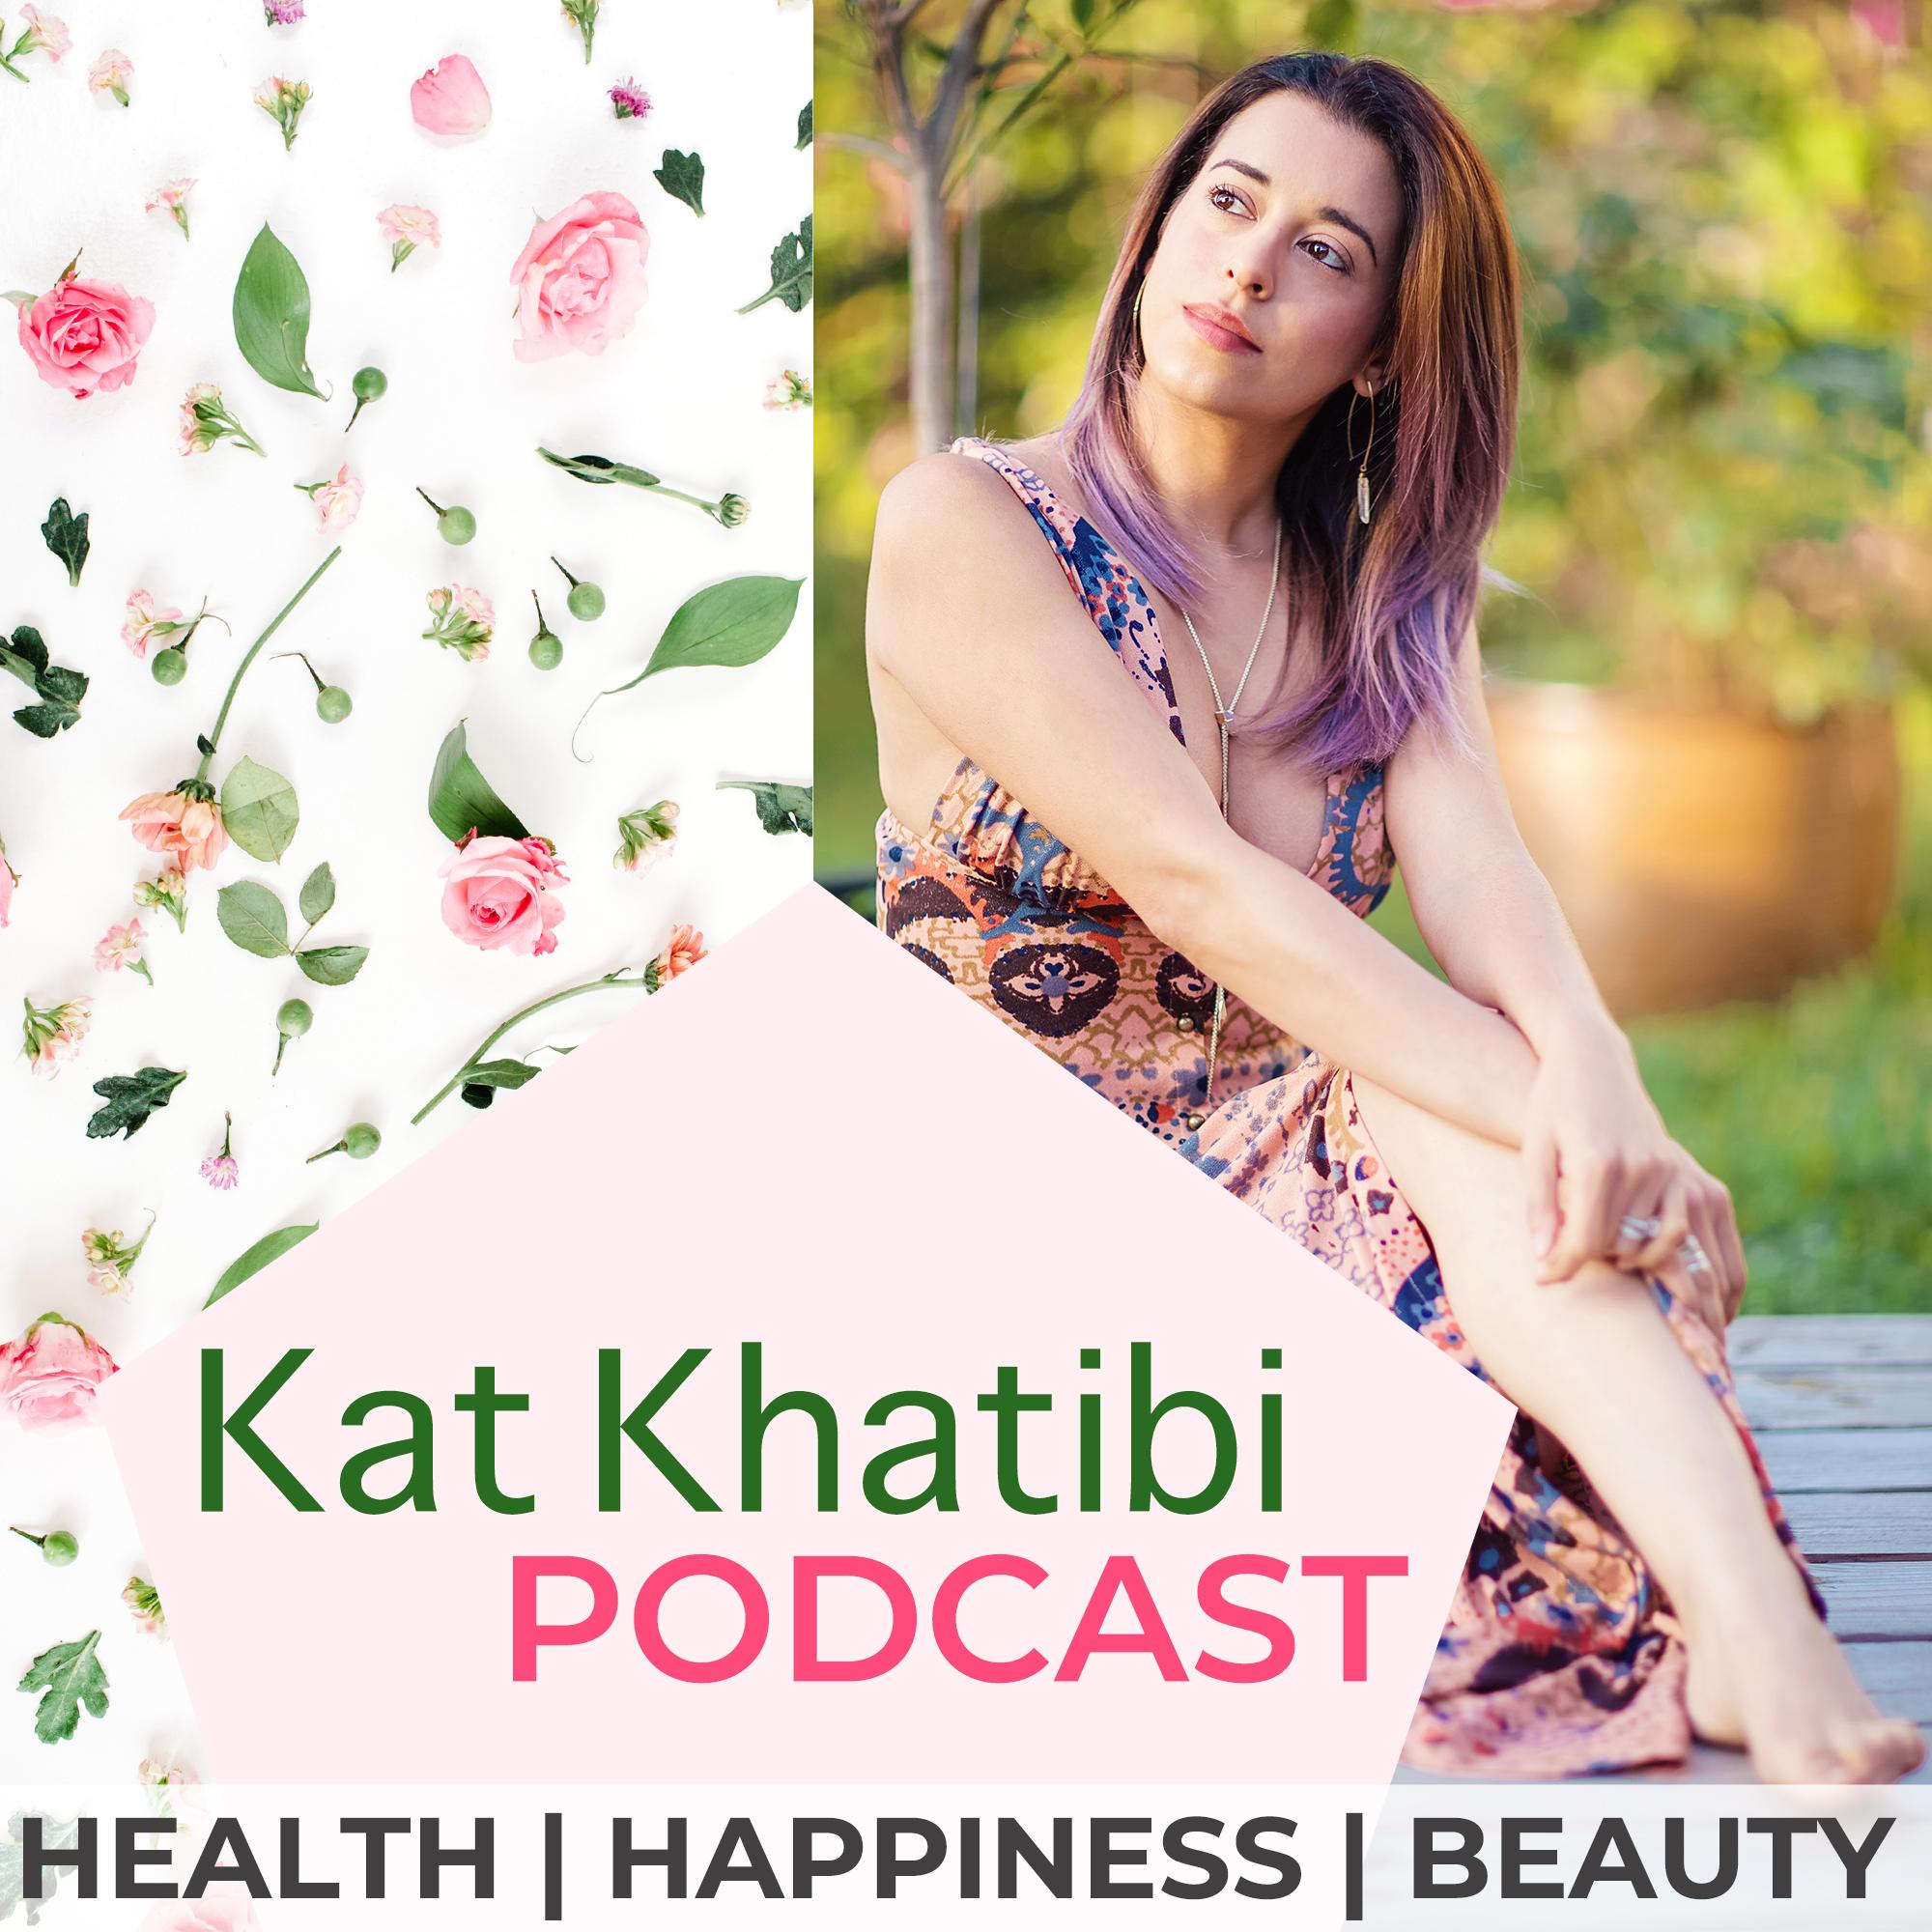 Kat Khatibi Podcast - Health Happiness Beauty